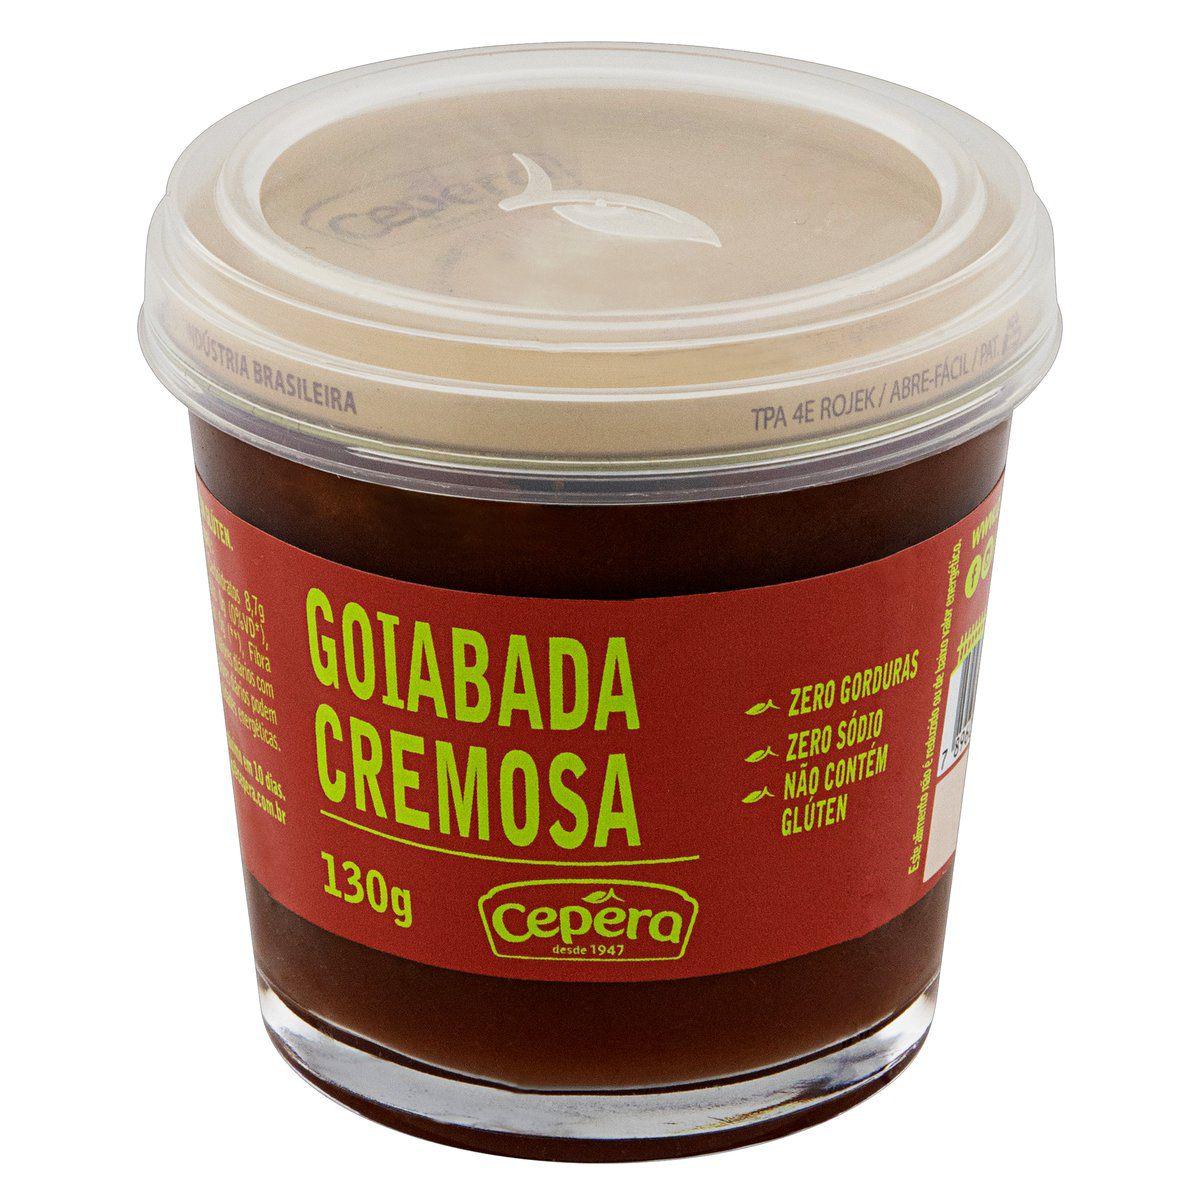 Goiabada Cremosa 130g